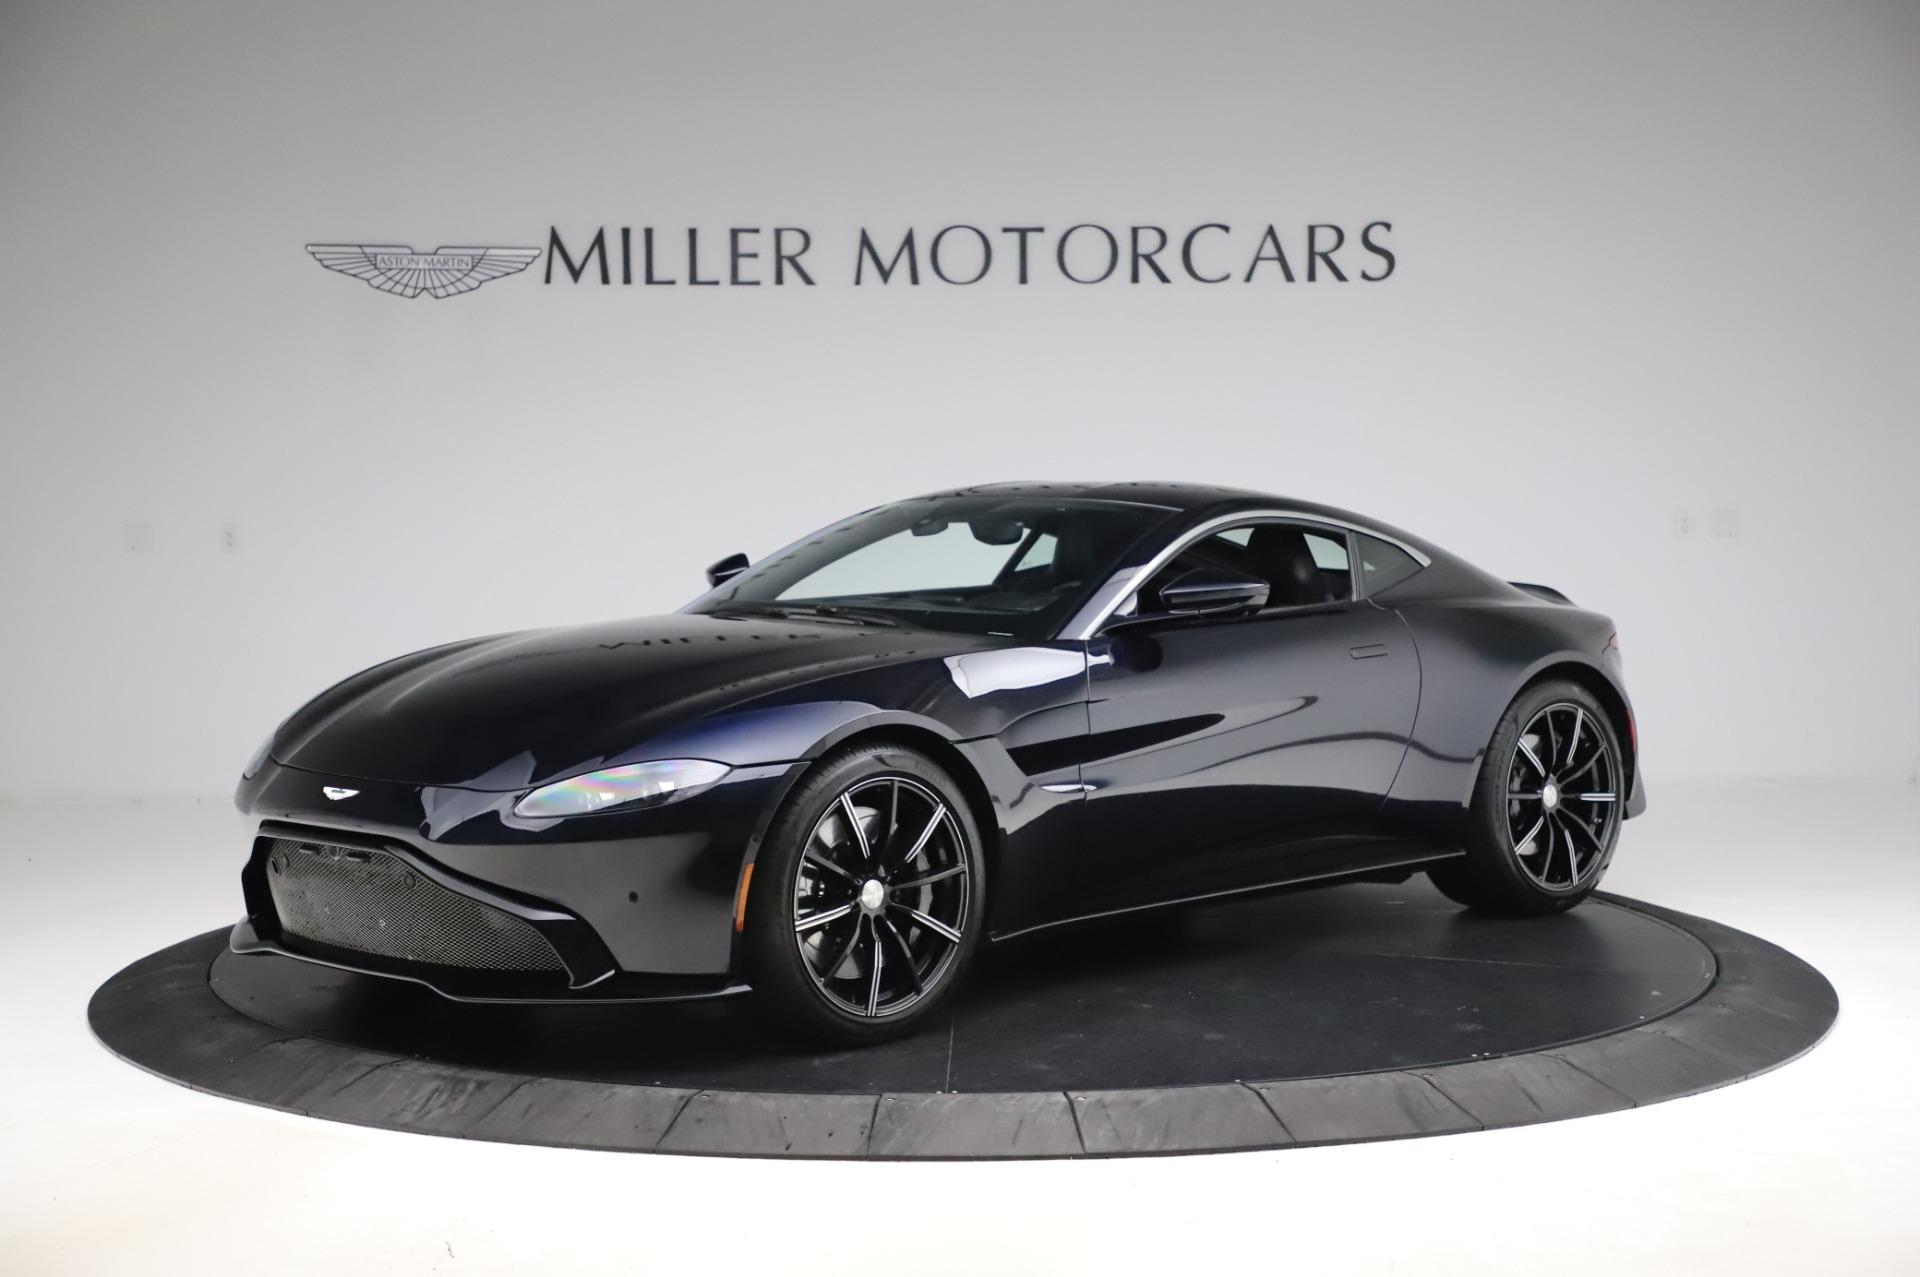 Used 2019 Aston Martin Vantage for sale $127,900 at Alfa Romeo of Westport in Westport CT 06880 1